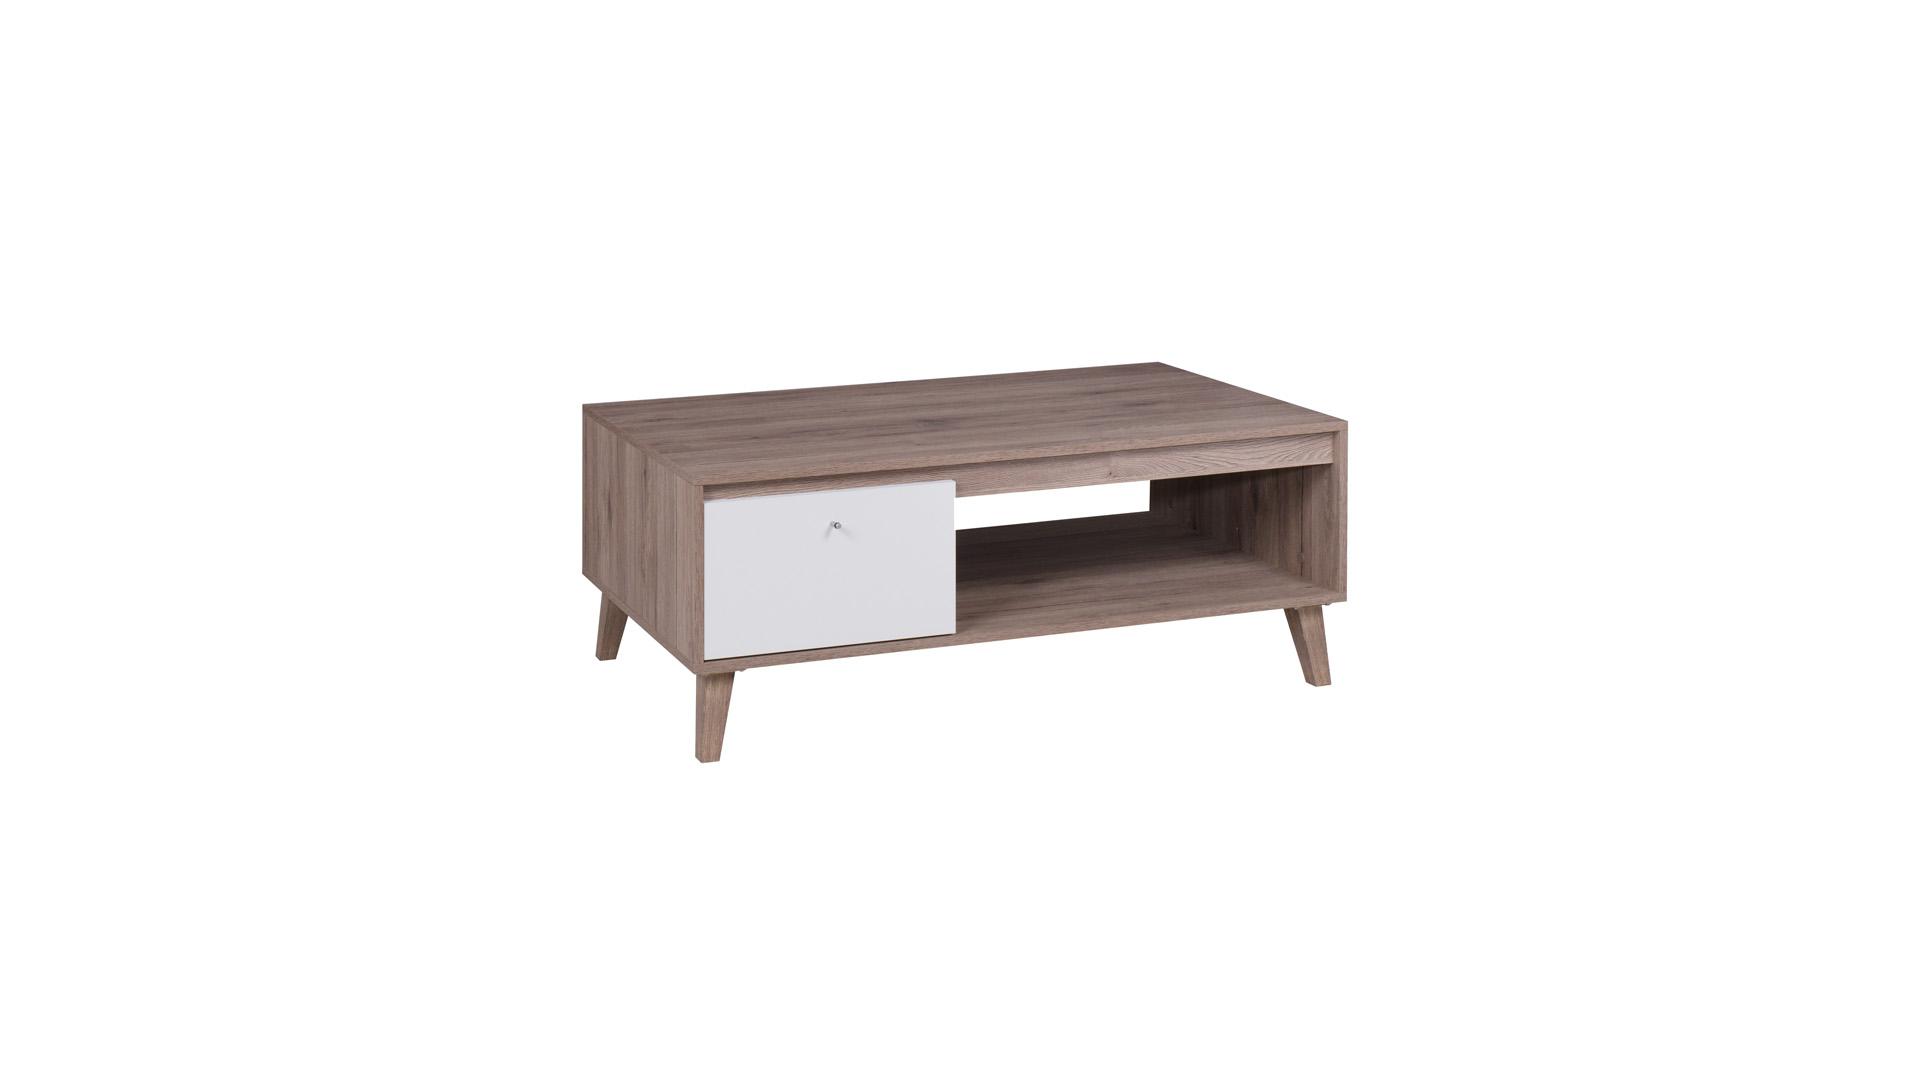 OVIEDO konferenční stolek, dub san remo tmavý/bílá